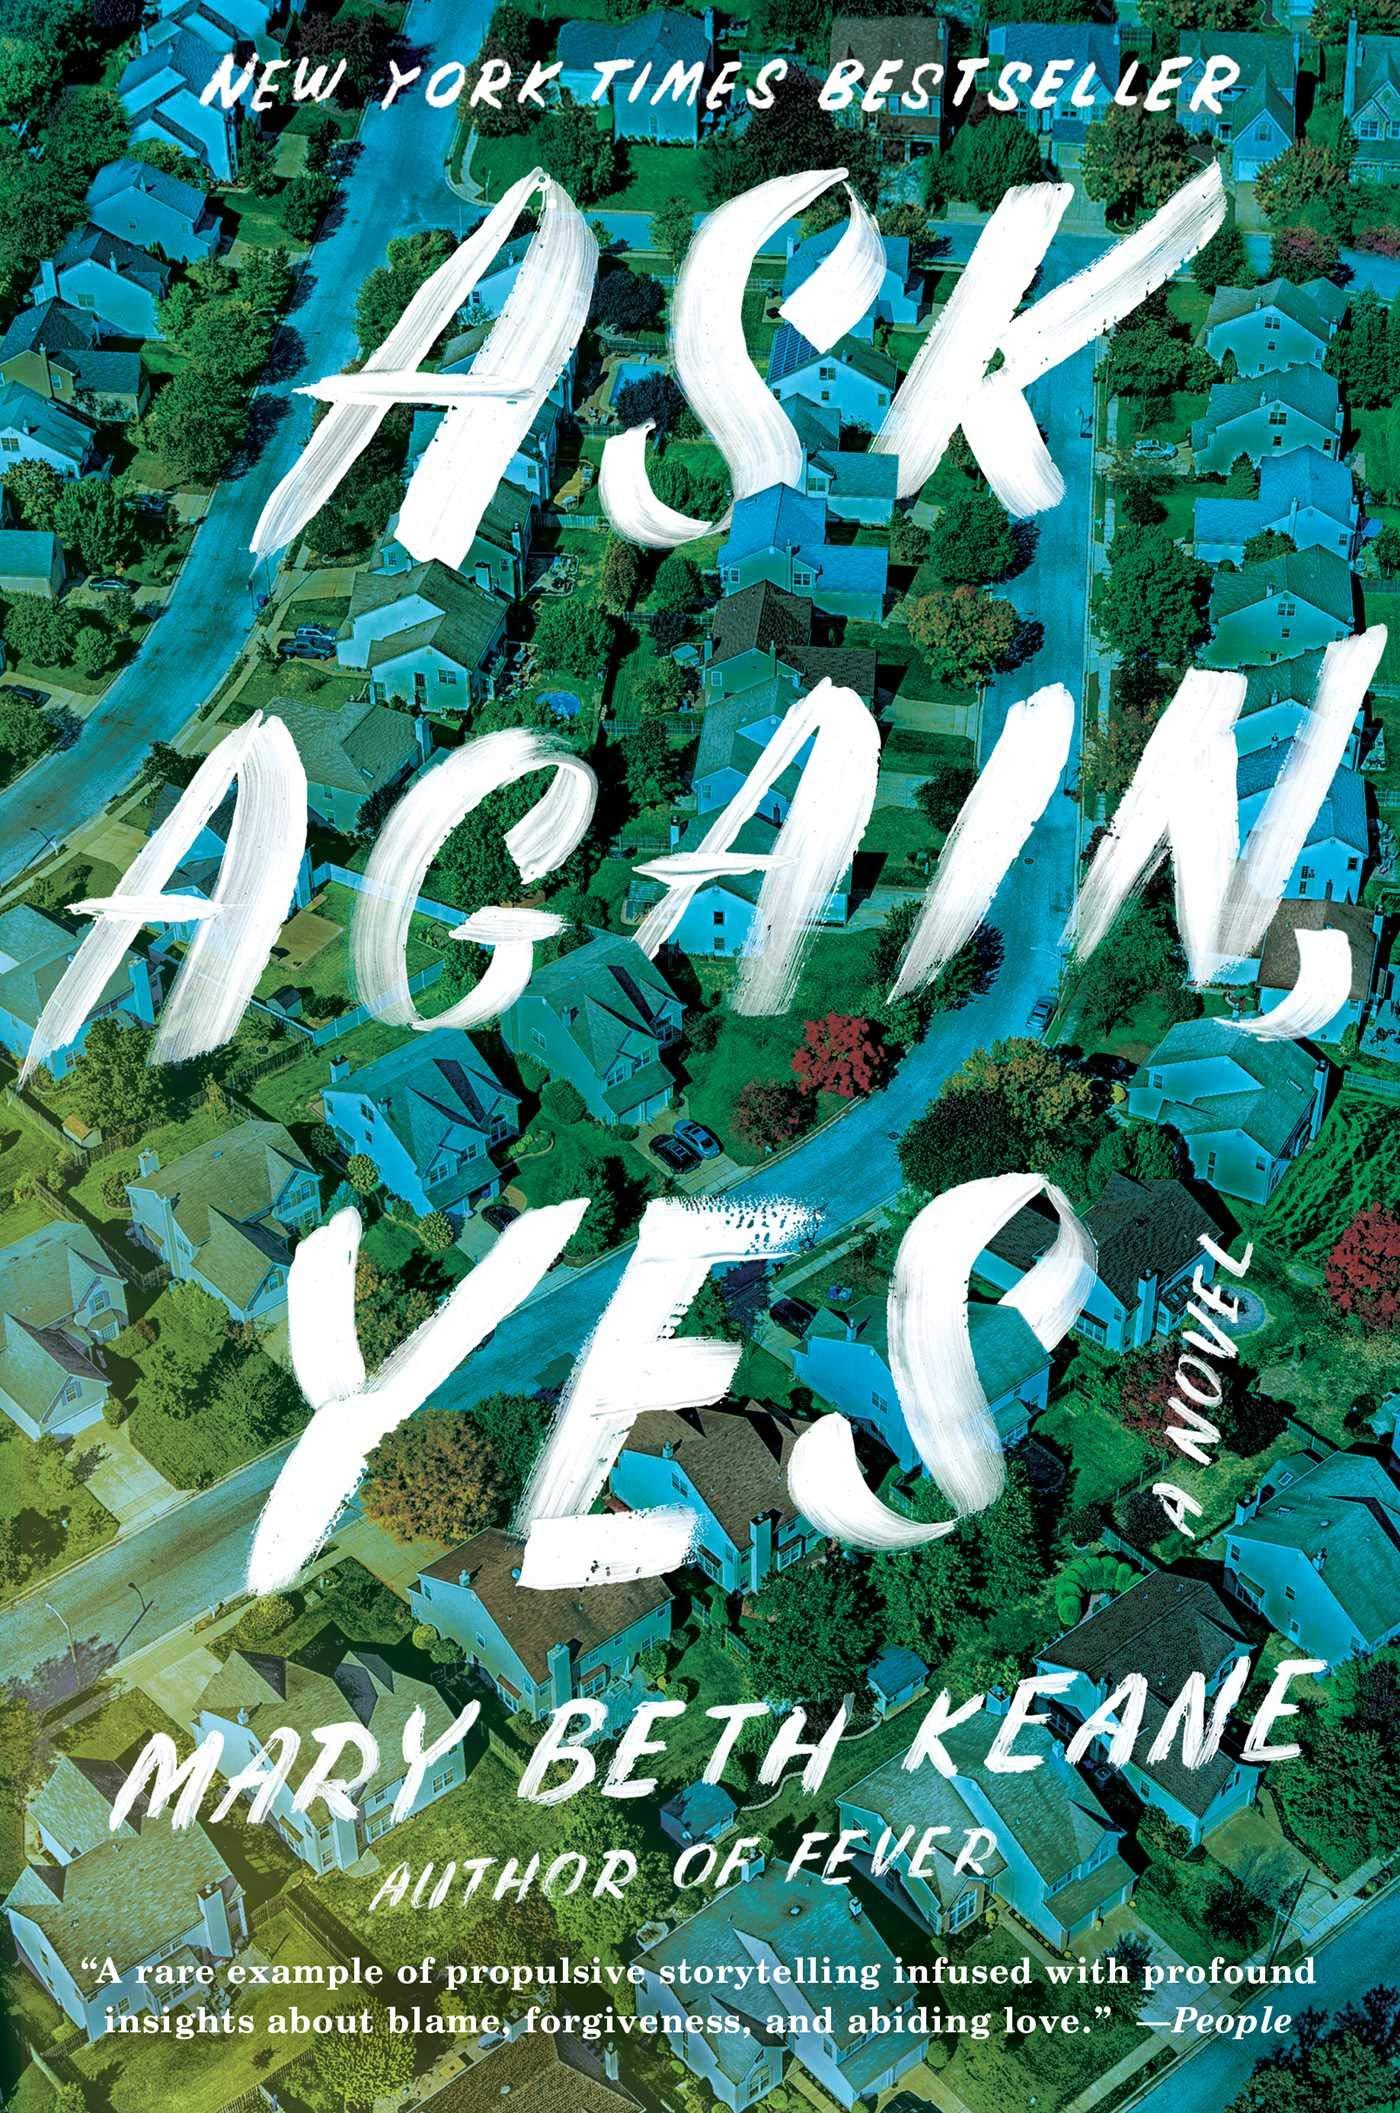 Ask Again, Yes: A Novel: Keane, Mary Beth: 9781982106980: Amazon.com: Books